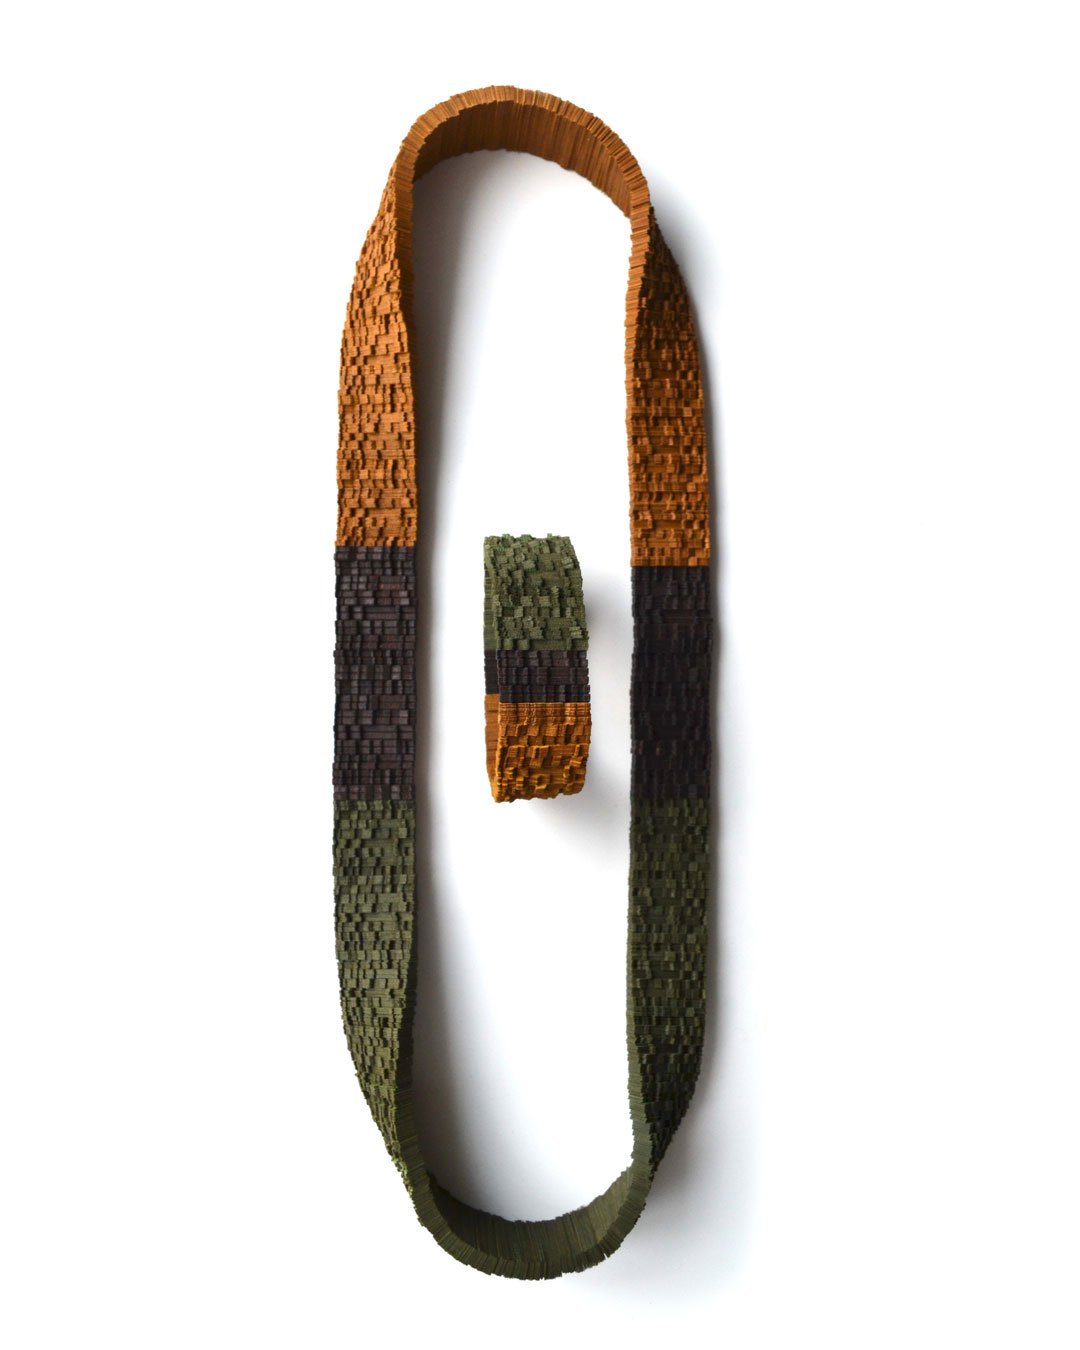 Genevieve Howard, Autumn in Paris, 2018, necklace with bracelet; Japanese linen paper, walnut, elastic cord, 310 x 200 x 25 mm / 70 x 25 mm, €2800